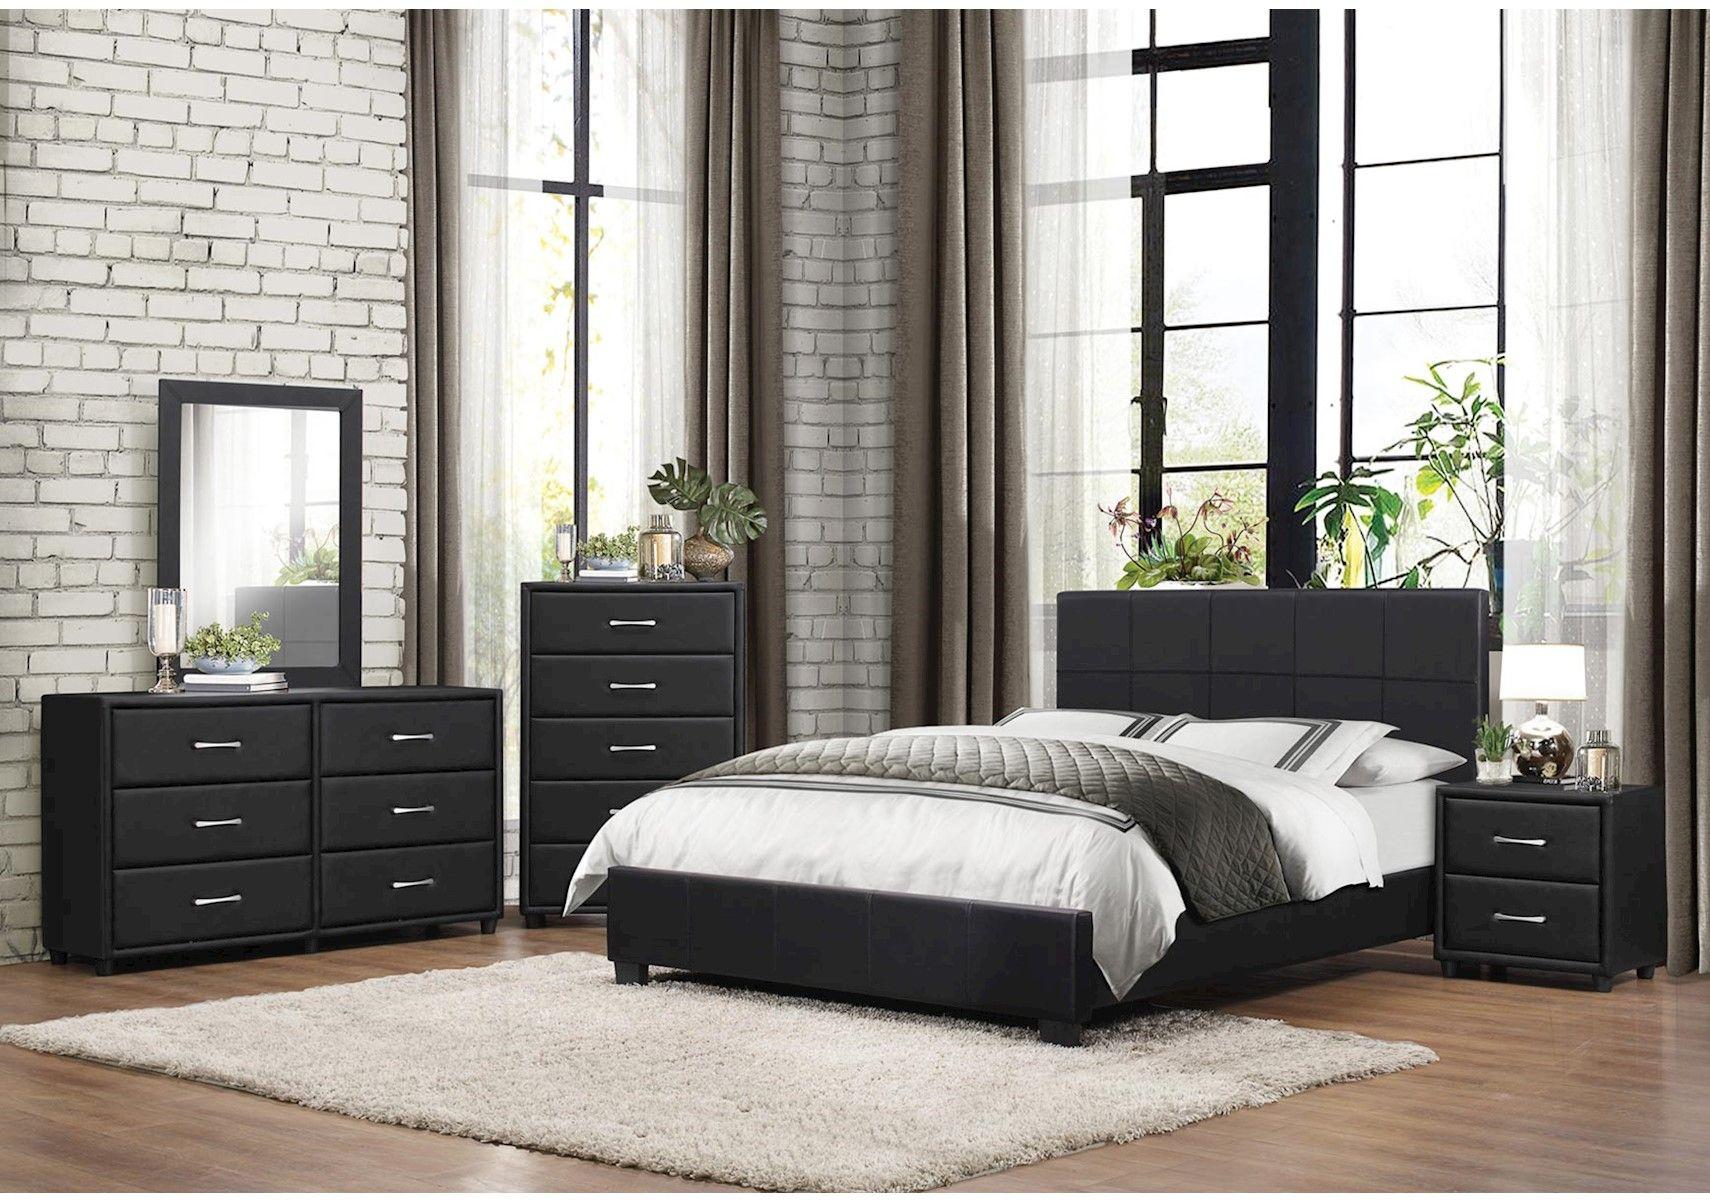 Lacks  Onyx 4Pc Queen Bedroom Set  Black & White Inspiration Entrancing Black Queen Bedroom Sets 2018